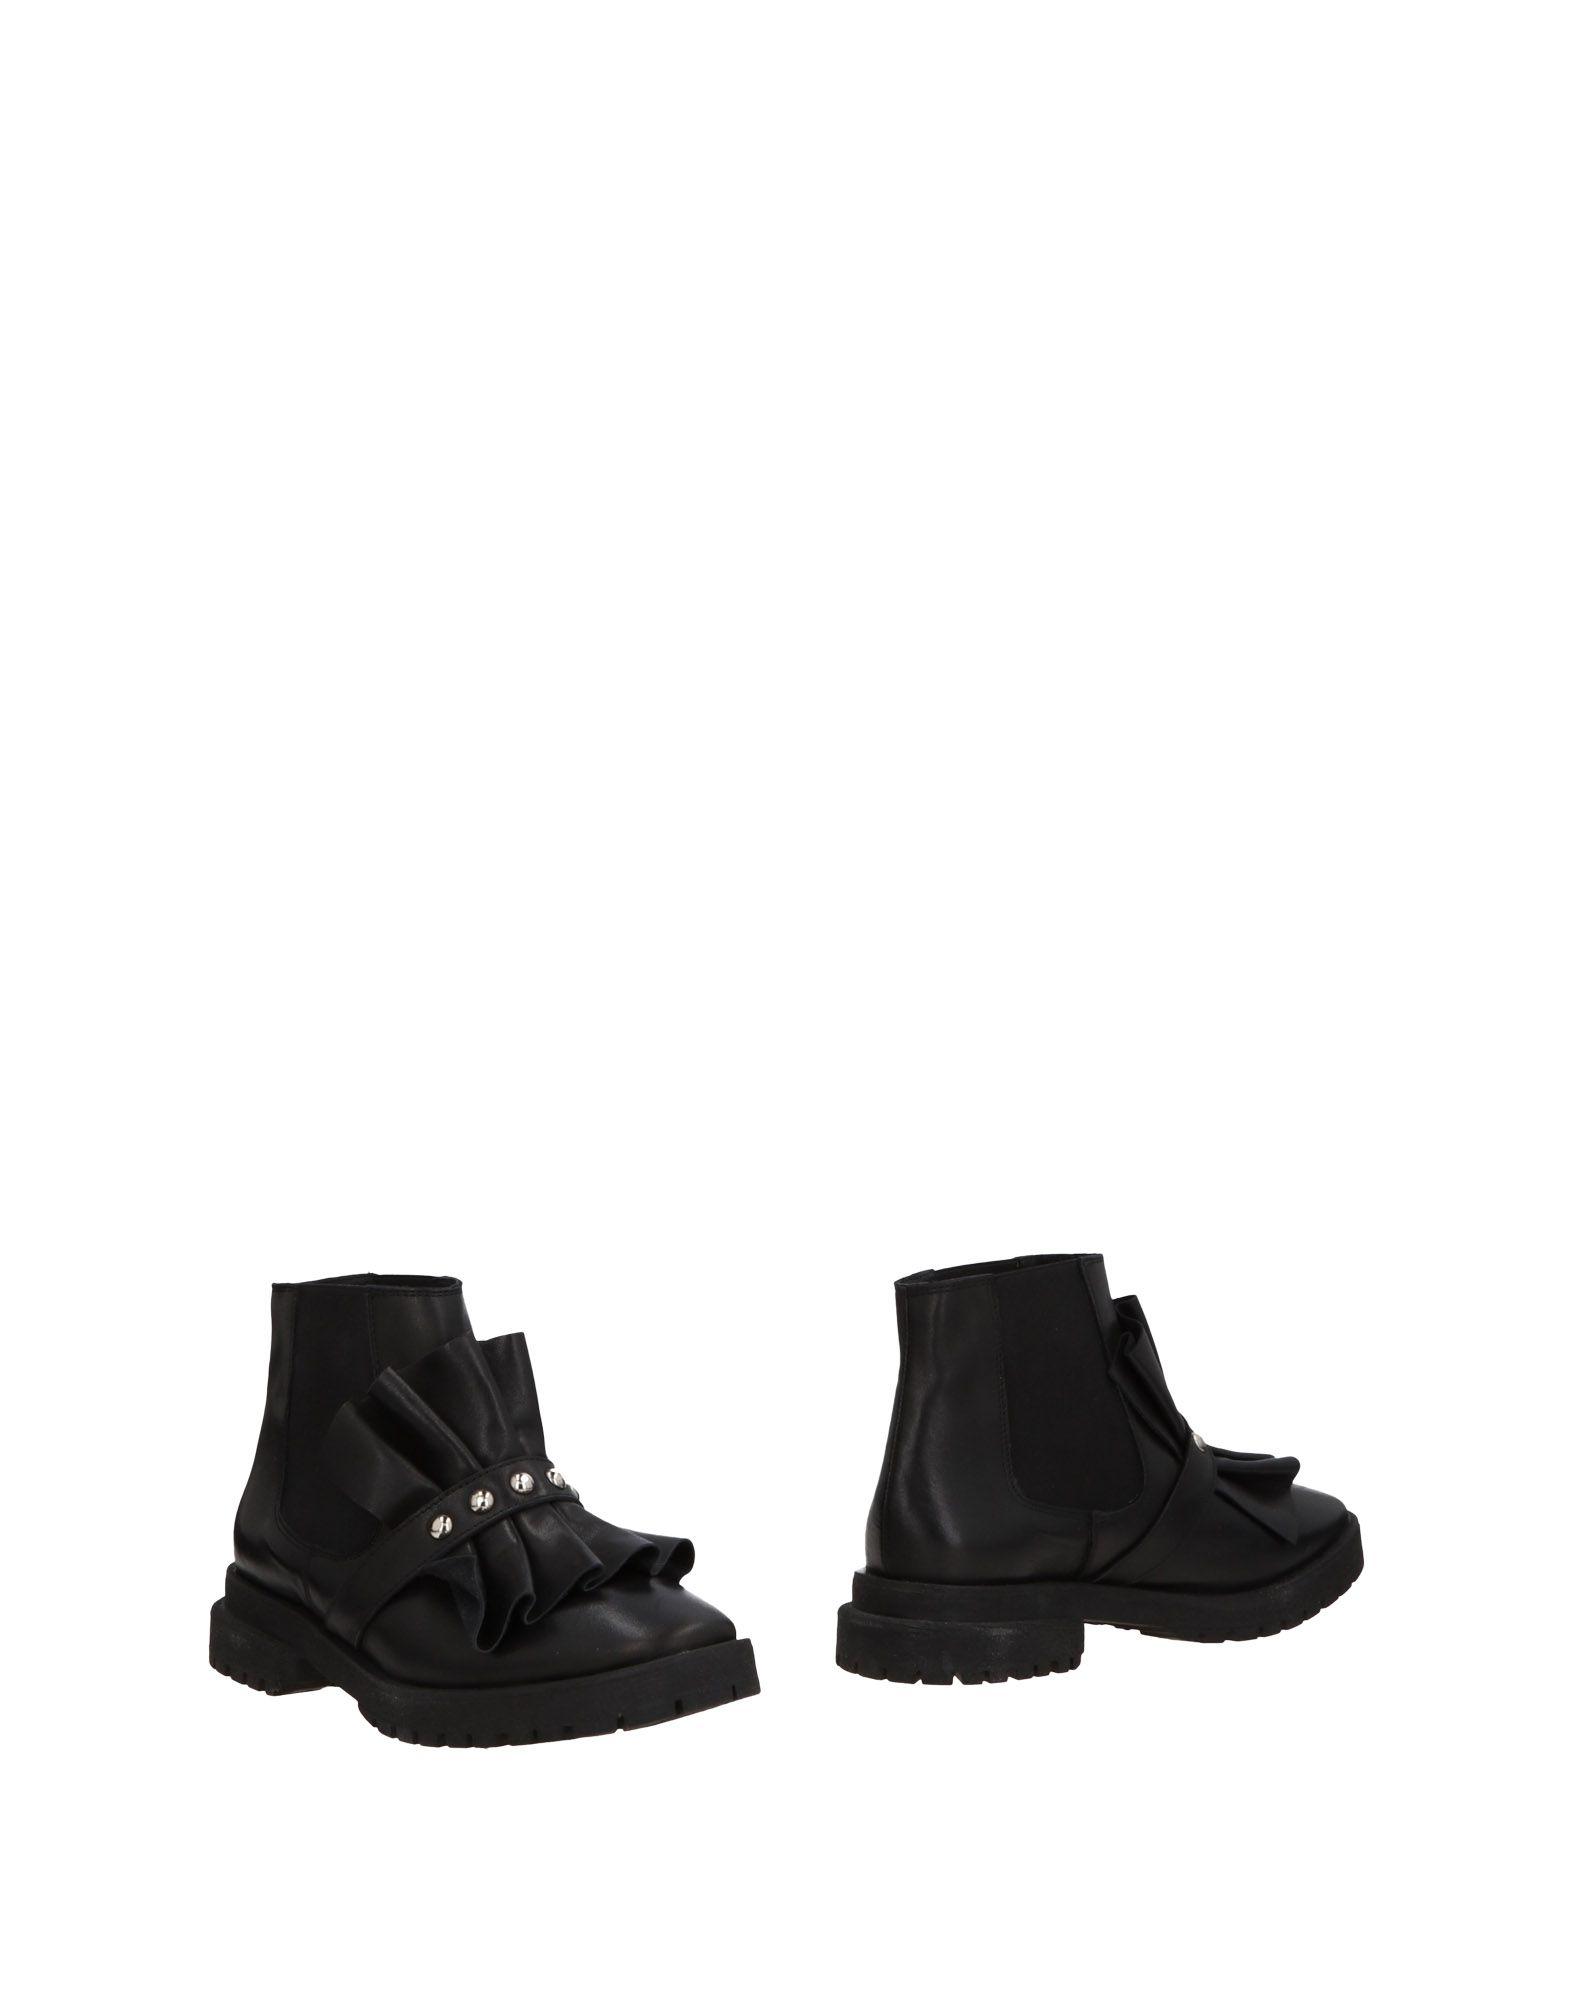 Unlace Stiefelette Damen  beliebte 11474636HX Gute Qualität beliebte  Schuhe 83d1d1